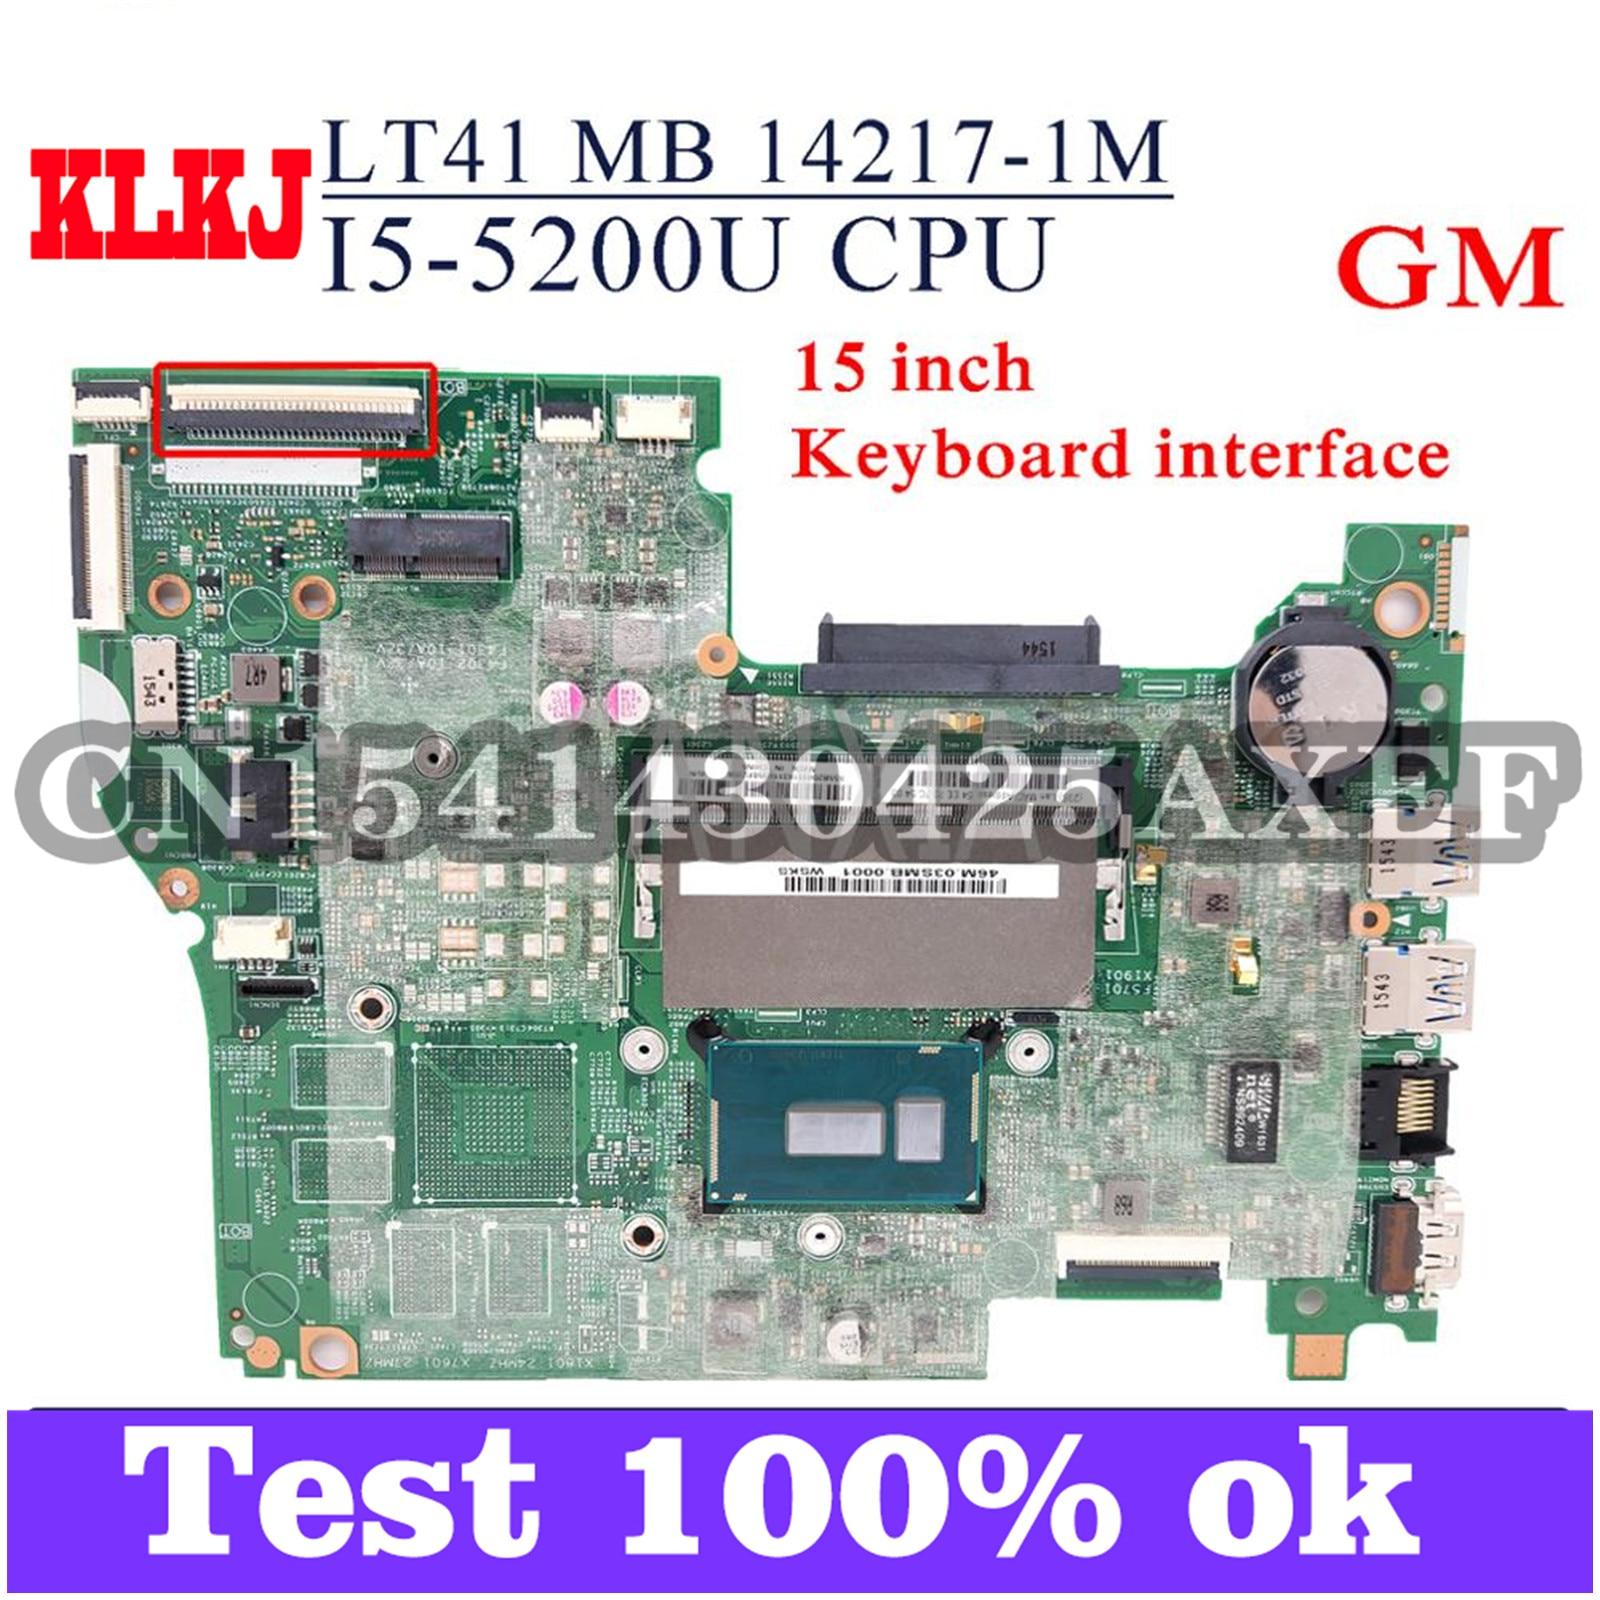 KLKJ LT41 MB 14217-1M Laotop اللوحة لينوفو اليوغا 500-15IBD FLEX3-1570 (15 بوصة) الأصلي اللوحة الرئيسية I5-5200U جنرال موتورز